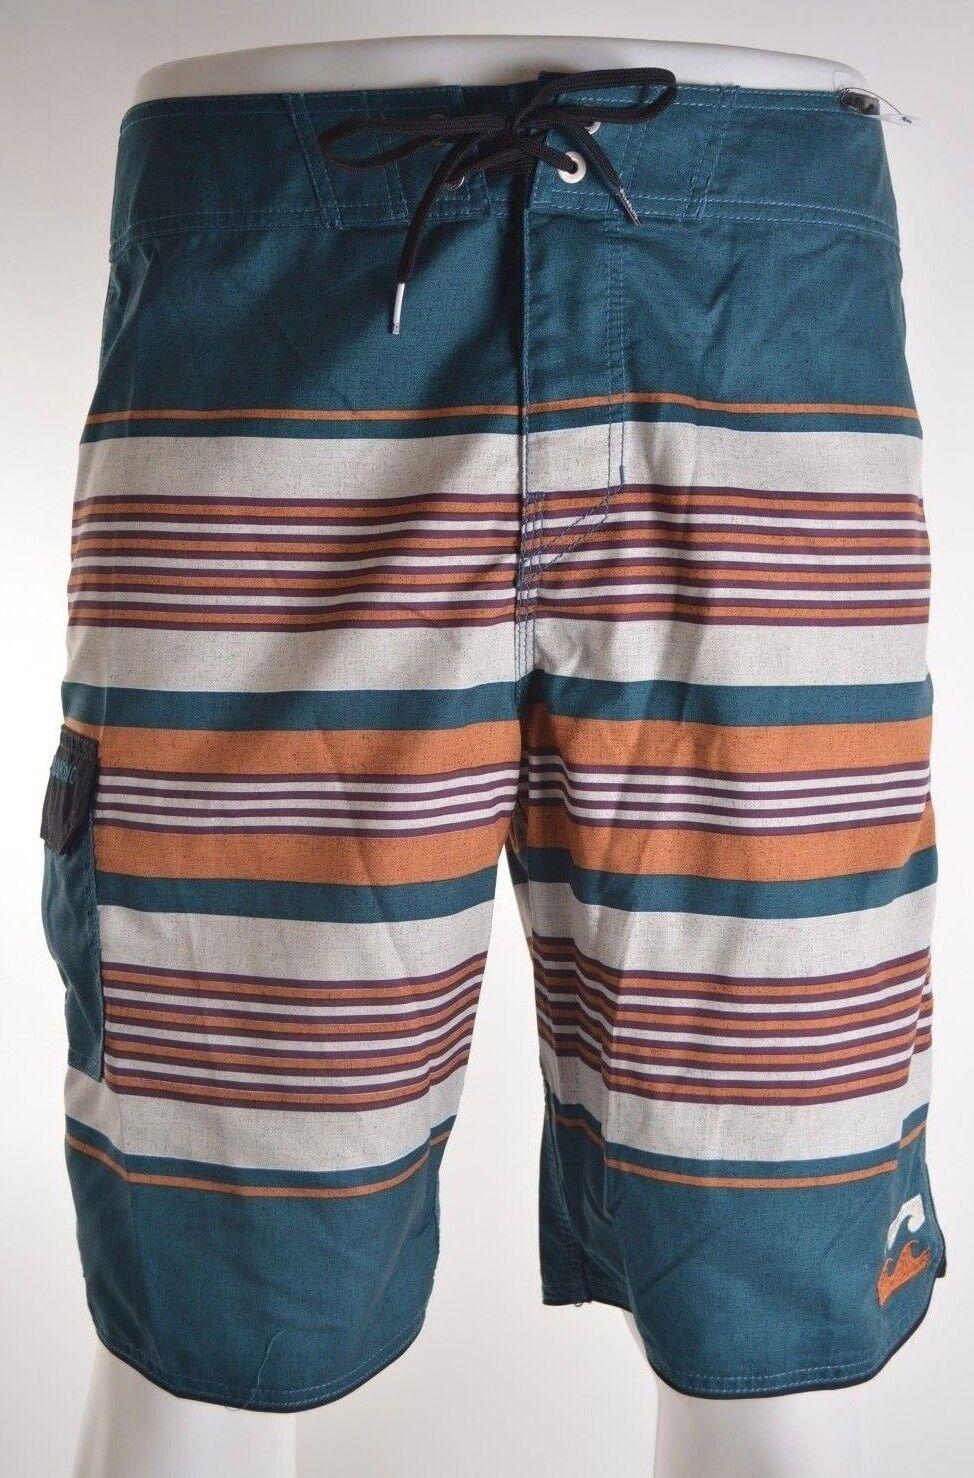 2015 NWT MENS BILLABONG ALL DAY STRIPE BOARDSHORT  32 deep sea embroidered